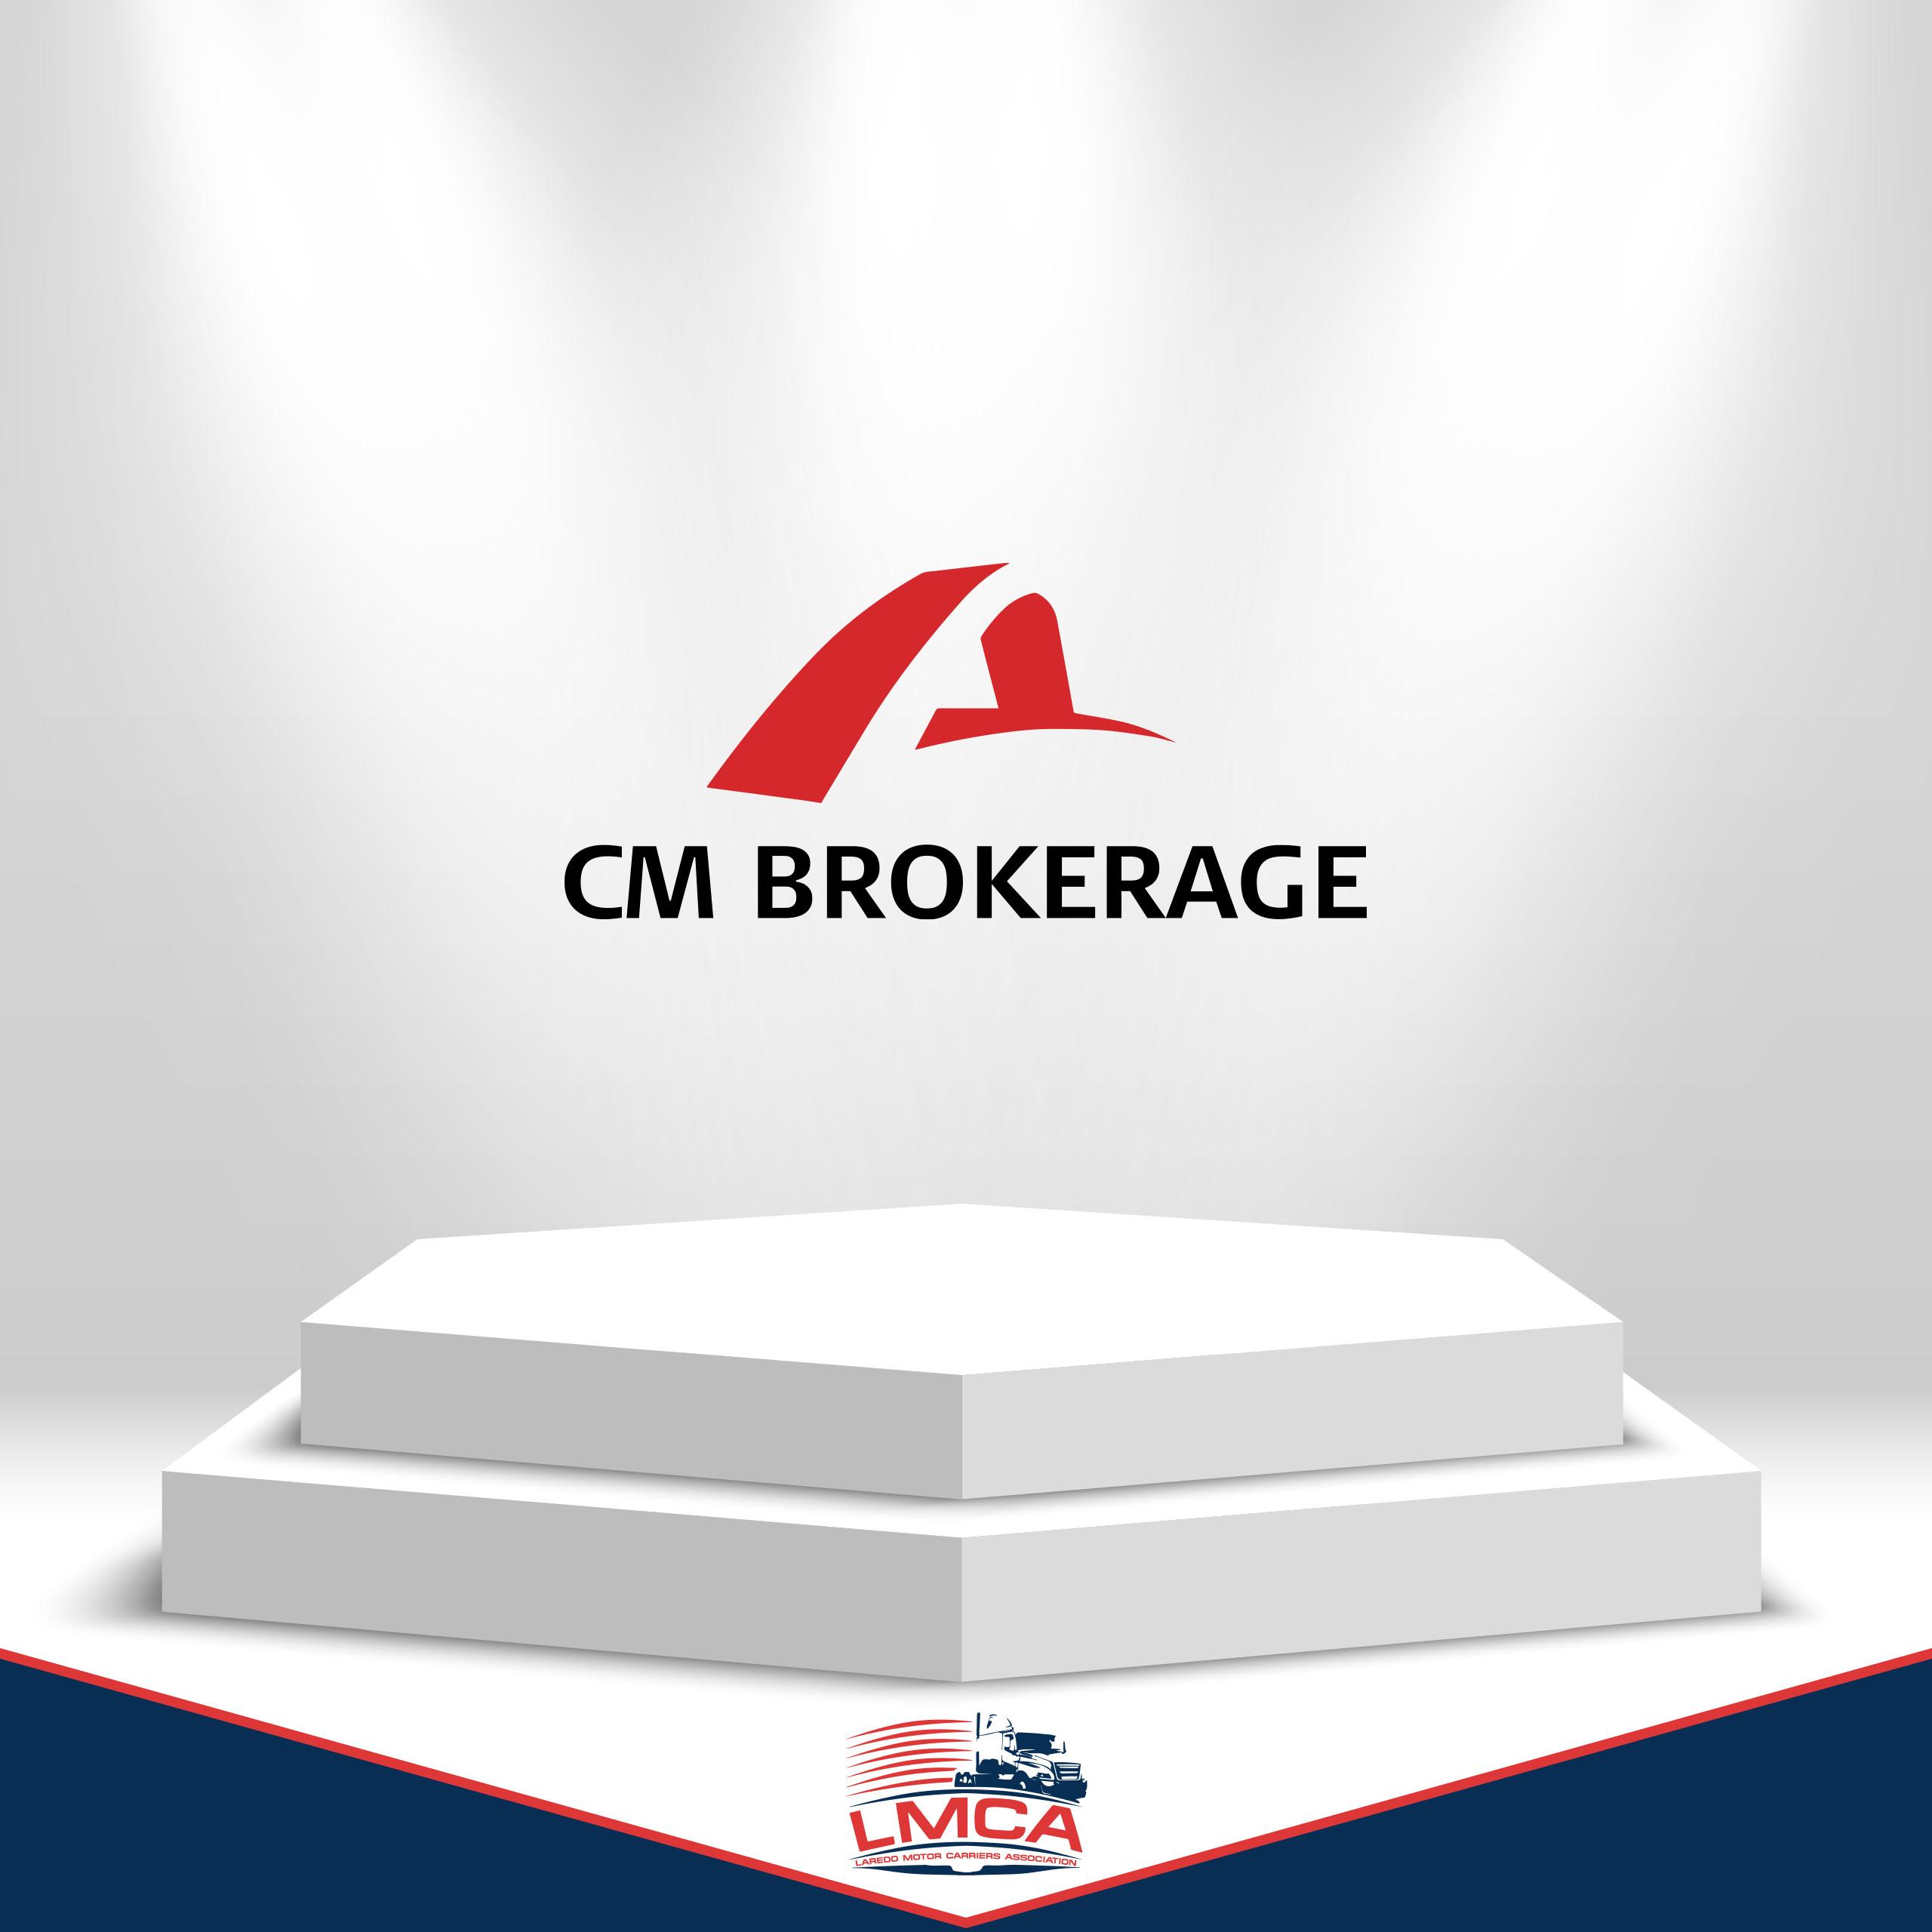 cm brokerage